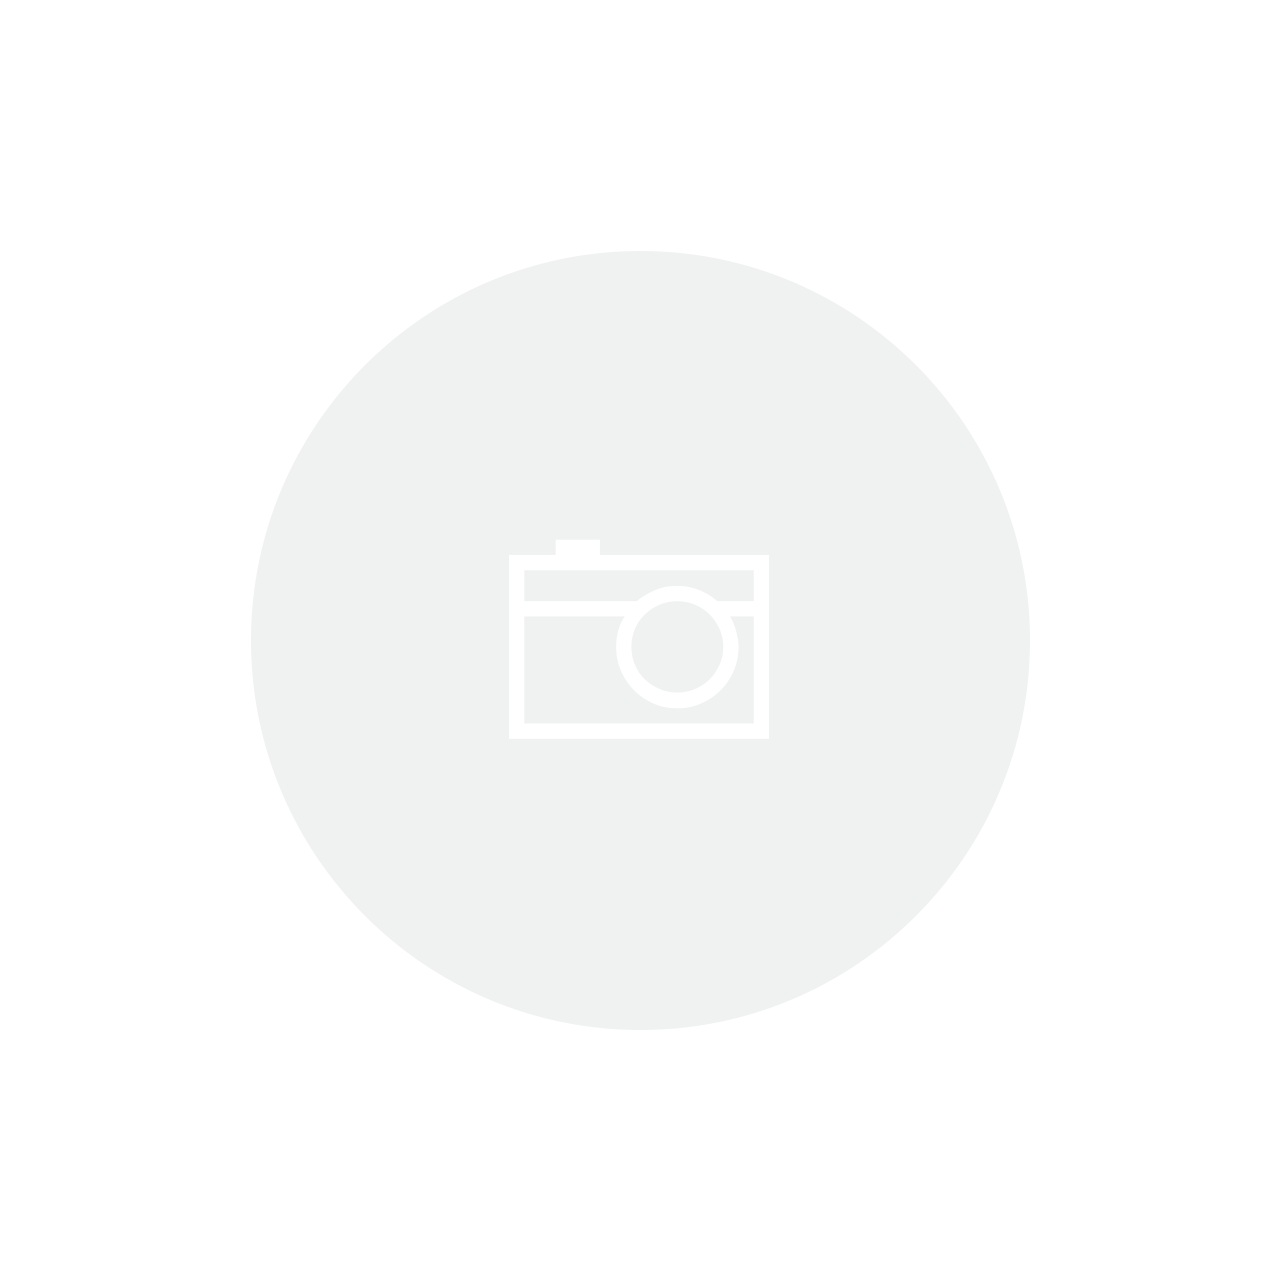 Fervedor Allegra 14 cm